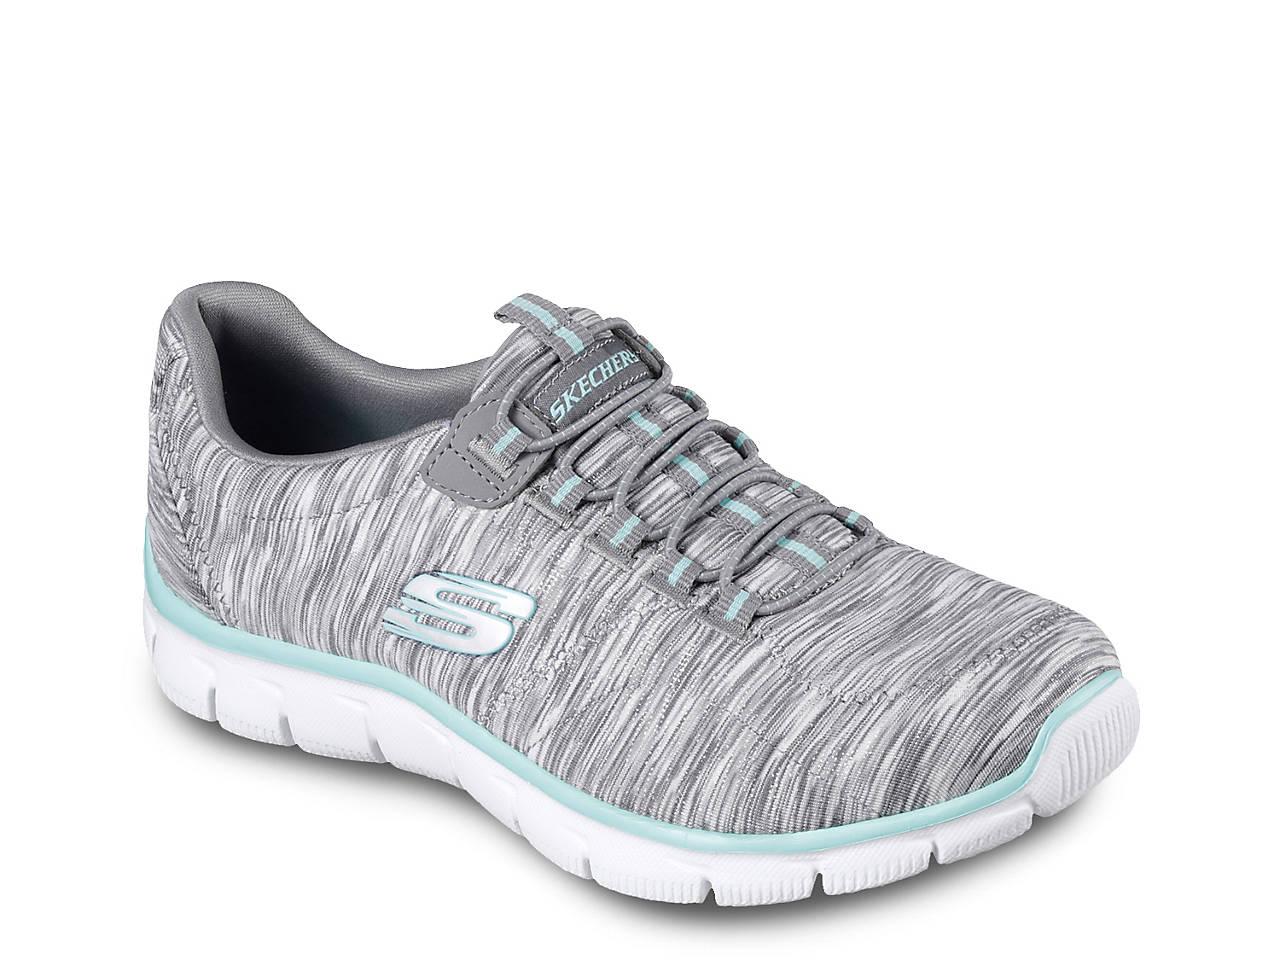 Skechers Relaxed Fit Empire Game On Slip-On Sneaker - Women s ... d5b767576f